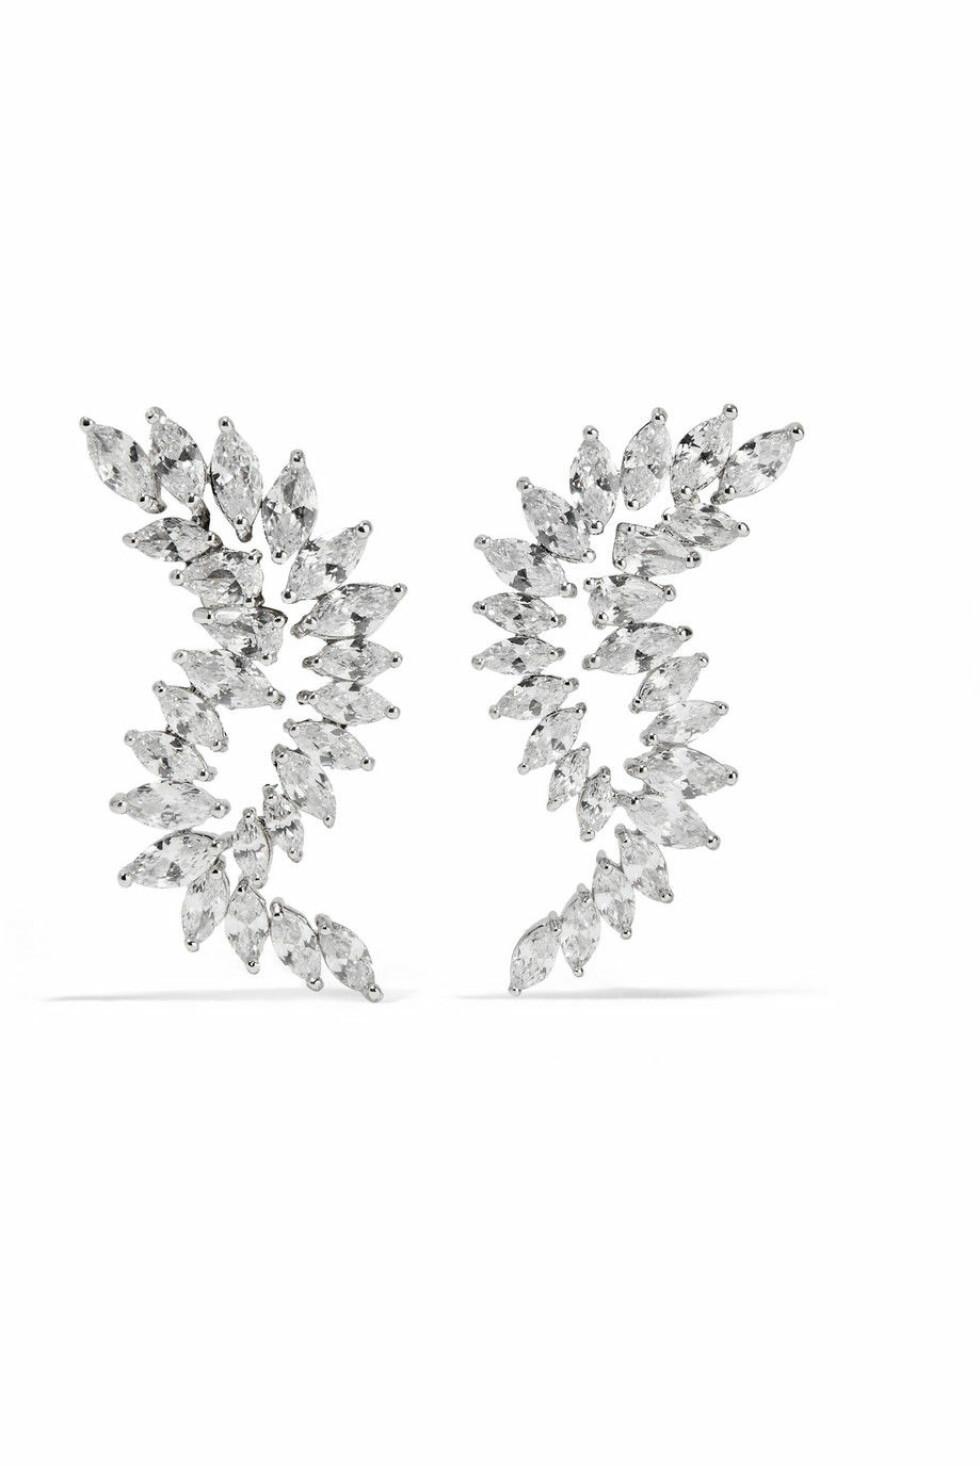 Øredobber fra Kenneth Jay Lane |885,-| https://www.net-a-porter.com/no/en/product/1064594/kenneth_jay_lane/rhodium-plated-cubic-zirconia-earrings